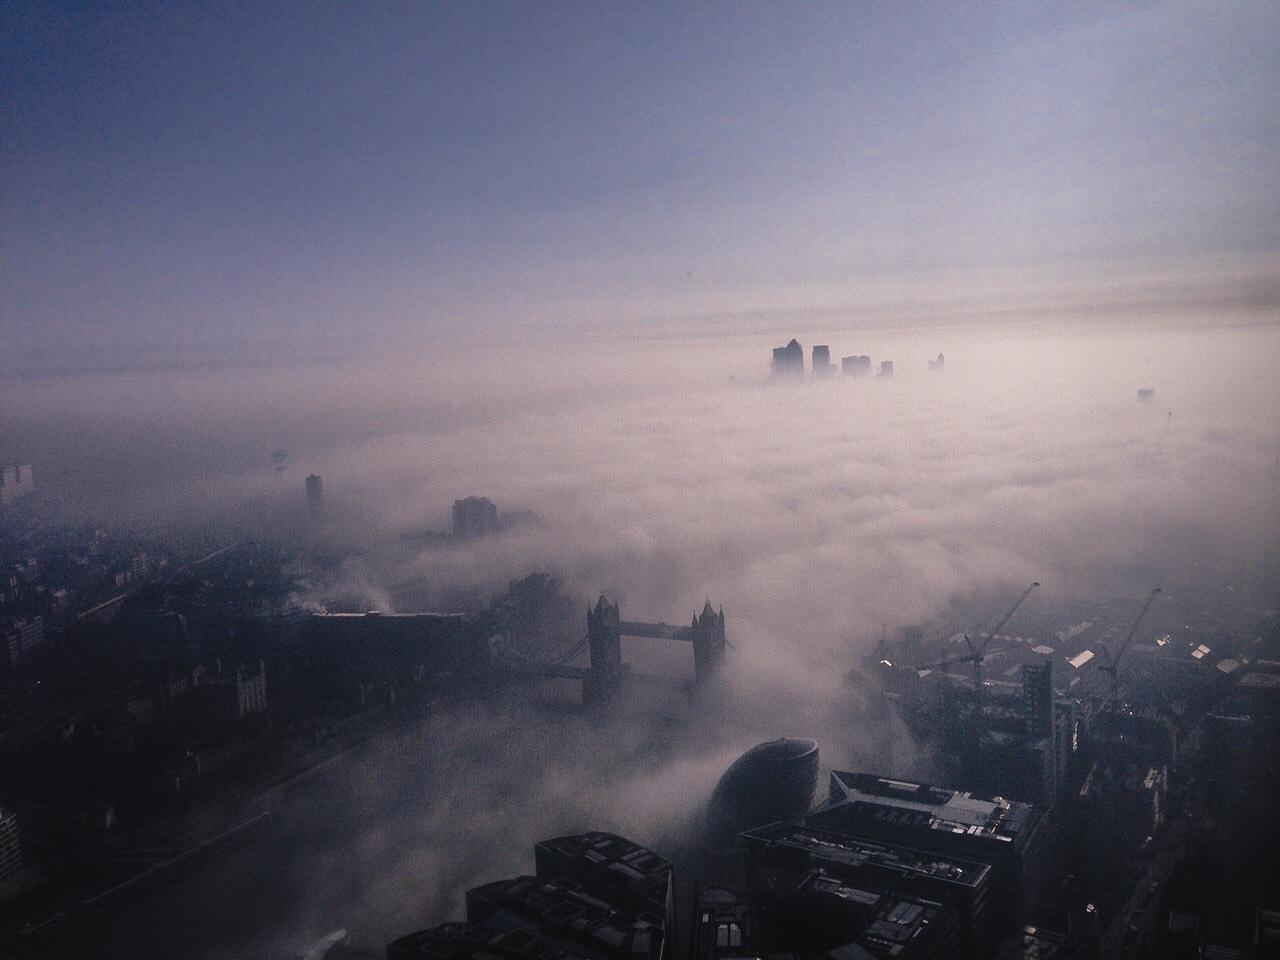 LONDON - COMING SOON